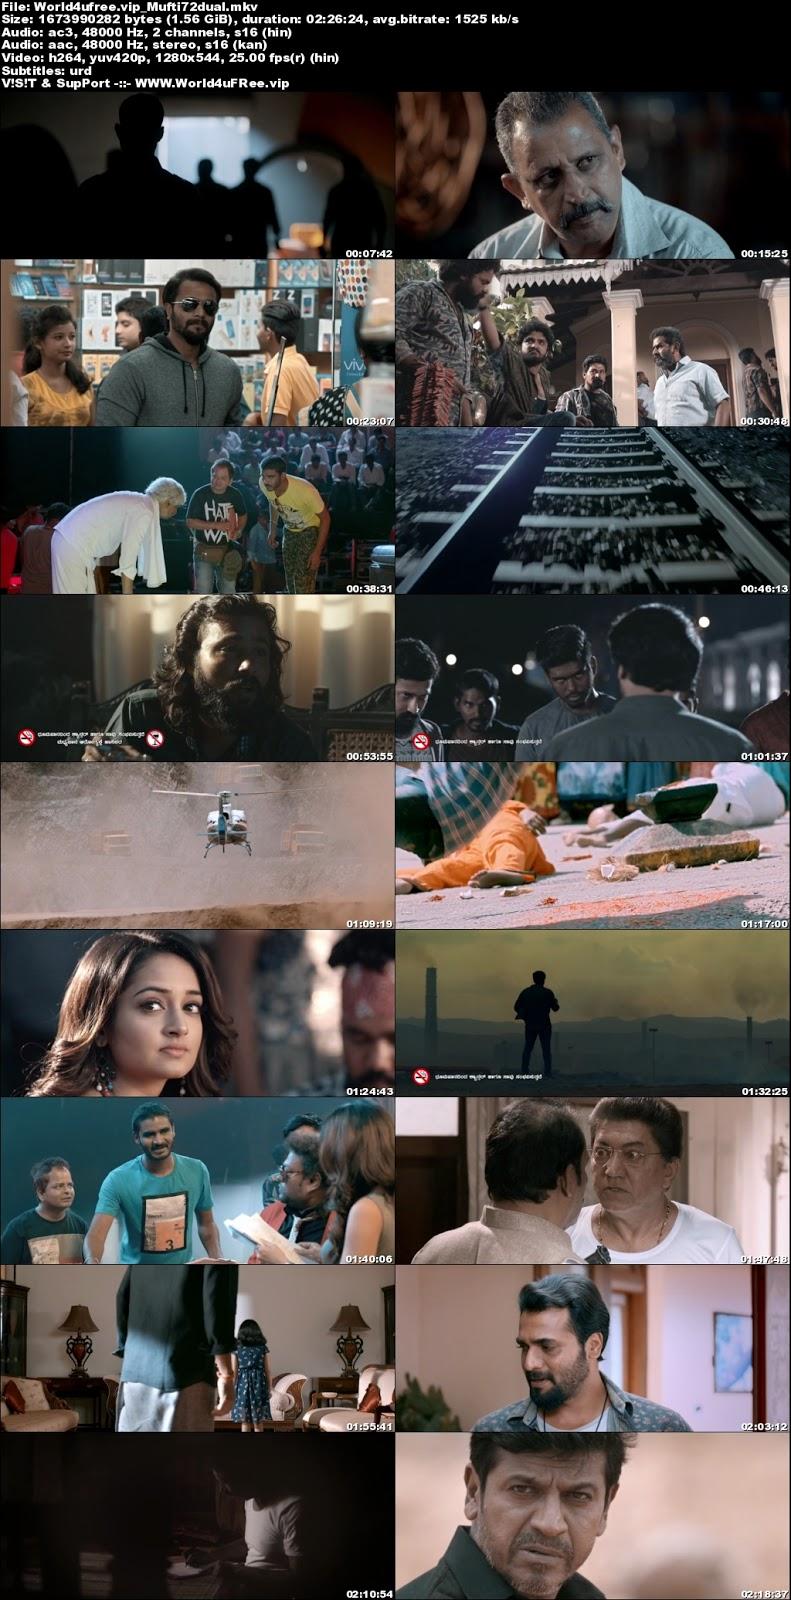 Mufti 2017 Dual Audio 720p UNCUT HDRip Download x264 world4ufree.vip , South indian movie Mufti 2017 hindi dubbed world4ufree.vip 720p hdrip webrip dvdrip 700mb brrip bluray free download or watch online at world4ufree.vip